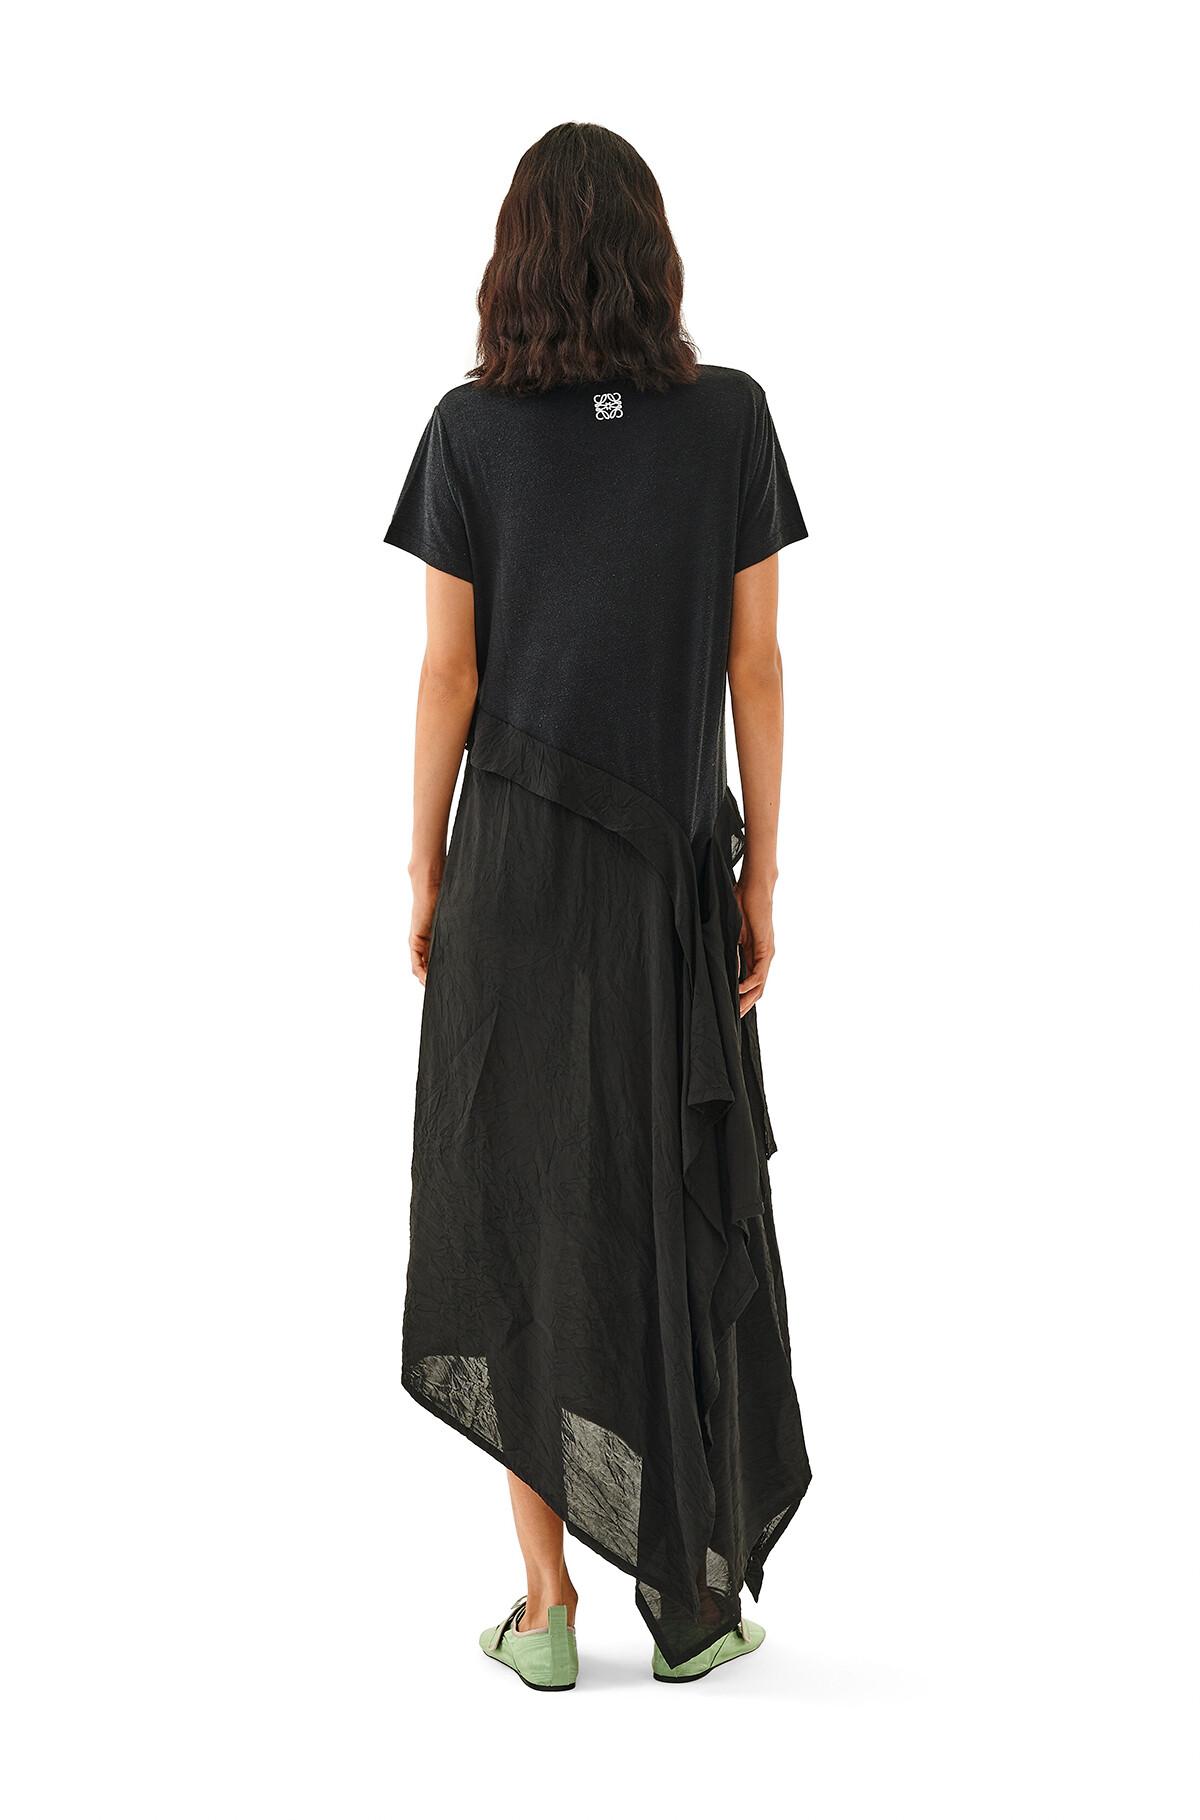 LOEWE Satin & Jersey T-Shirt Dress Negro front